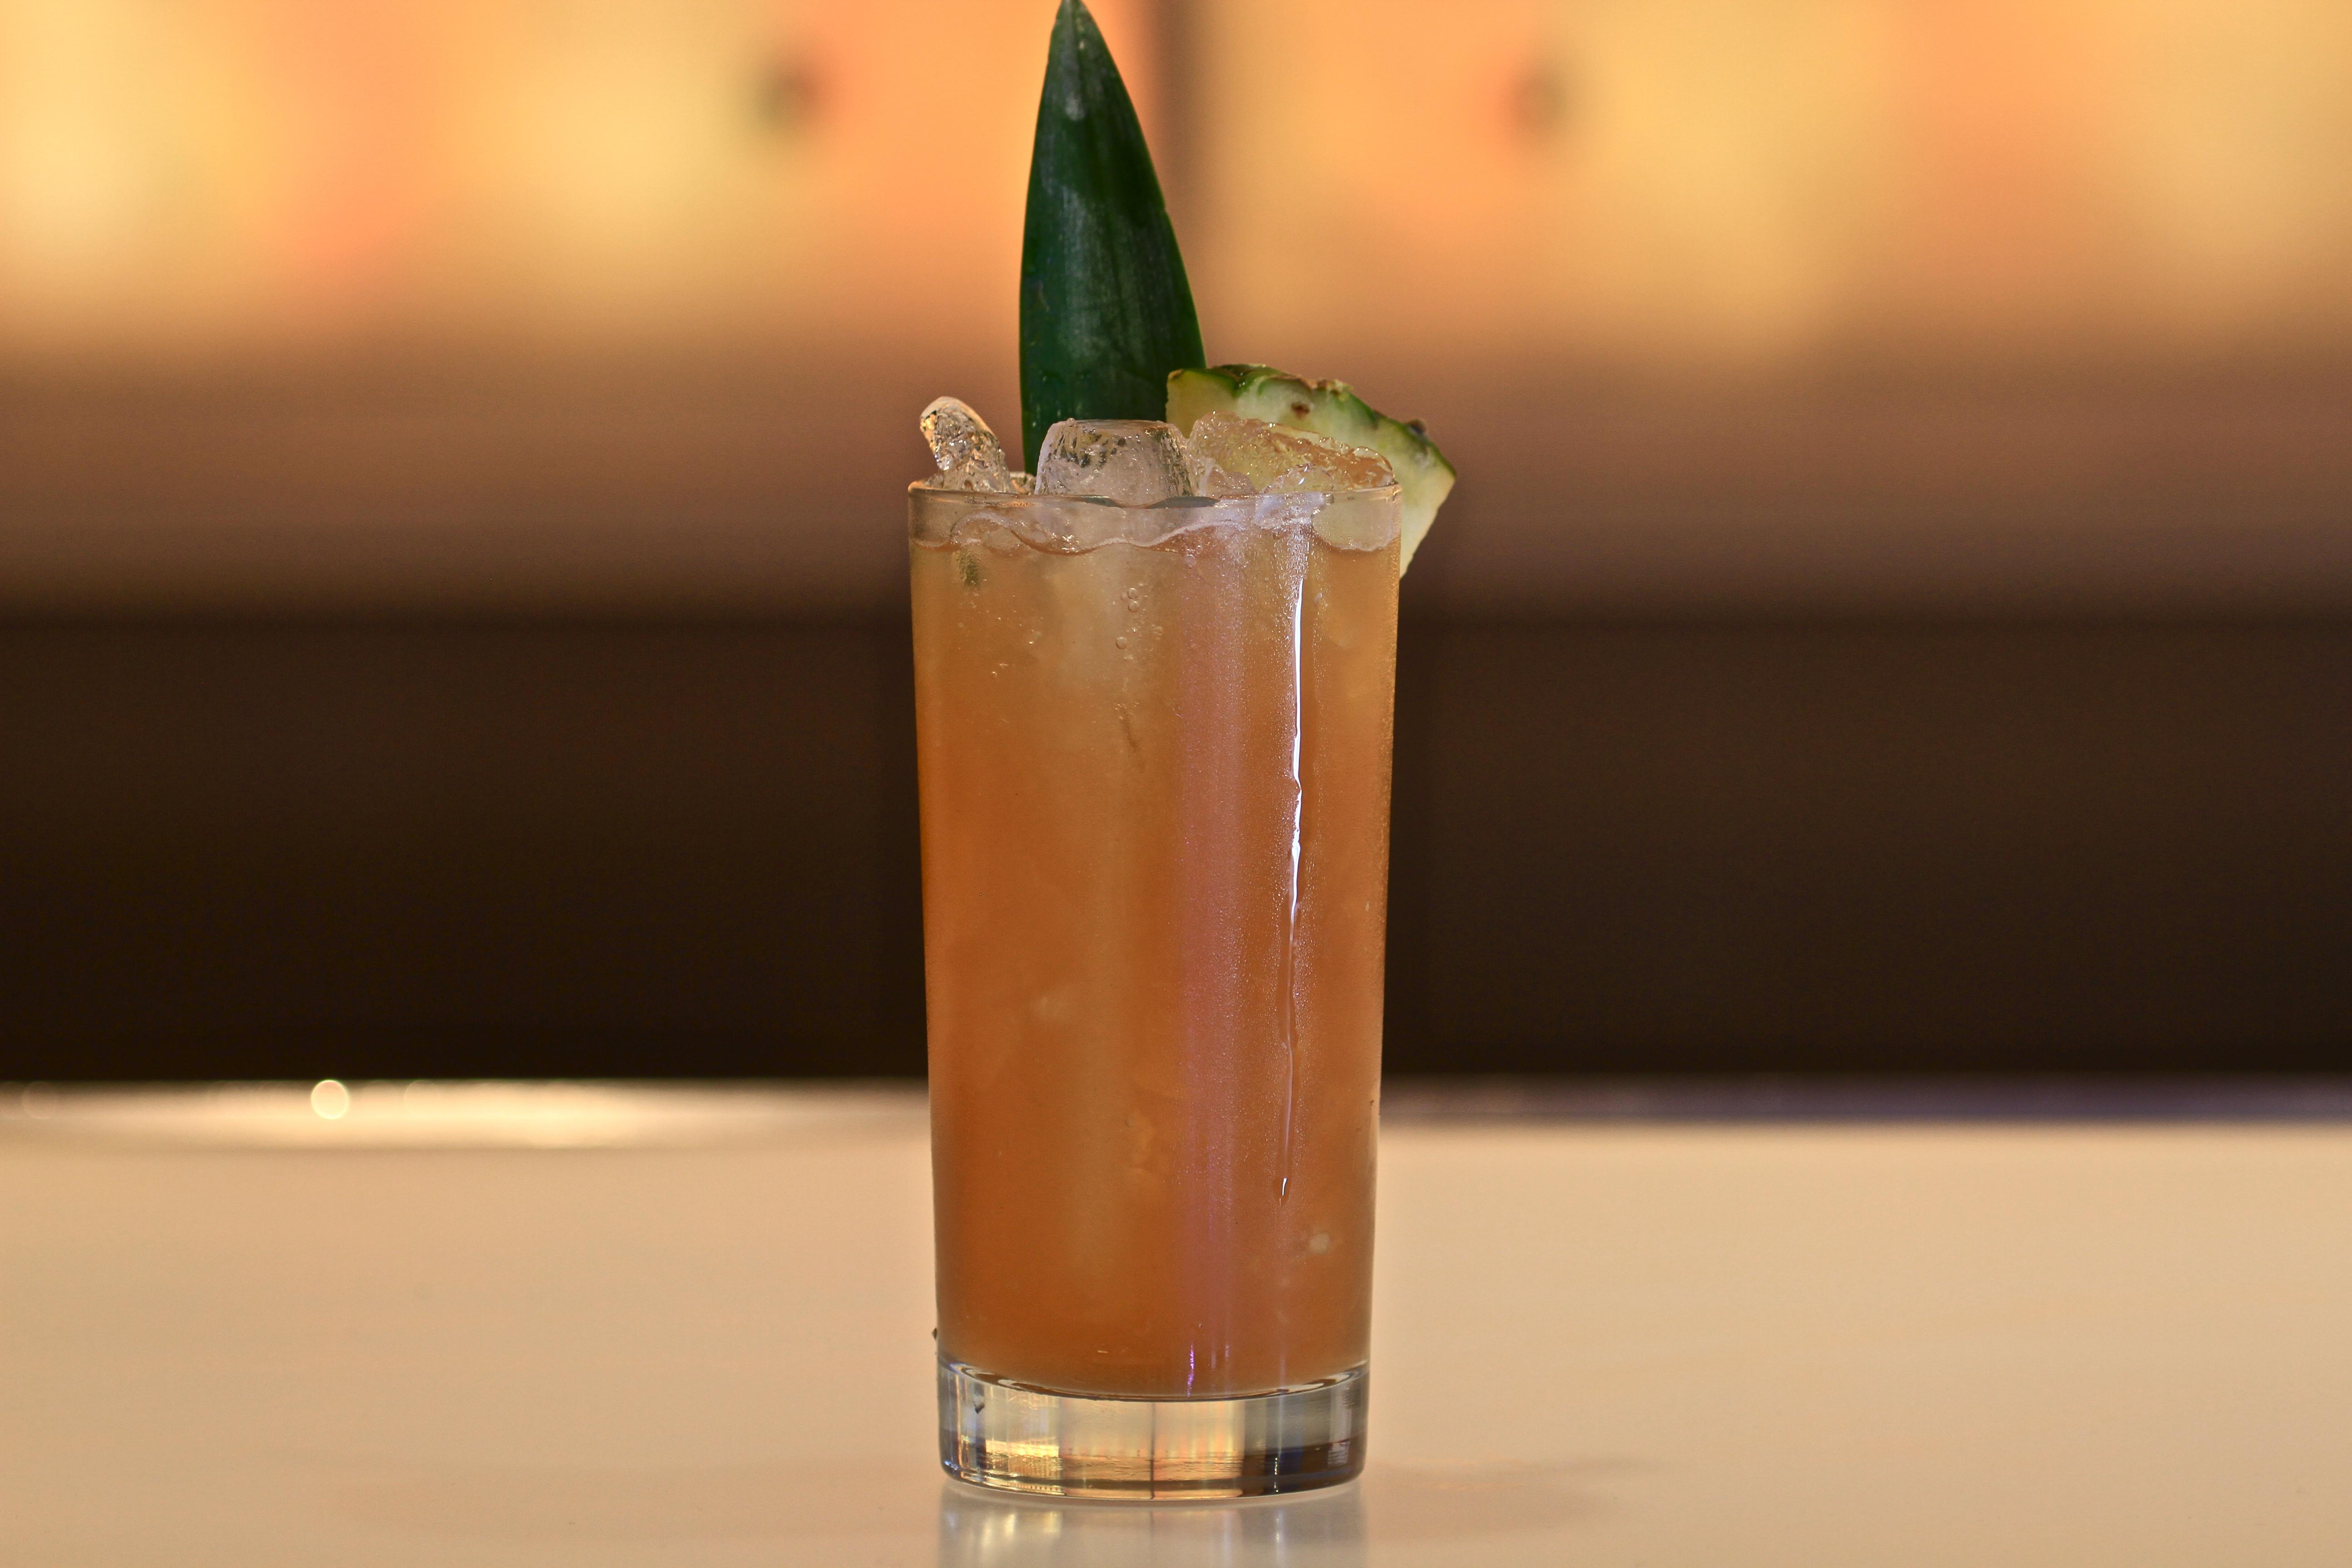 Pineapple Almond Margarita